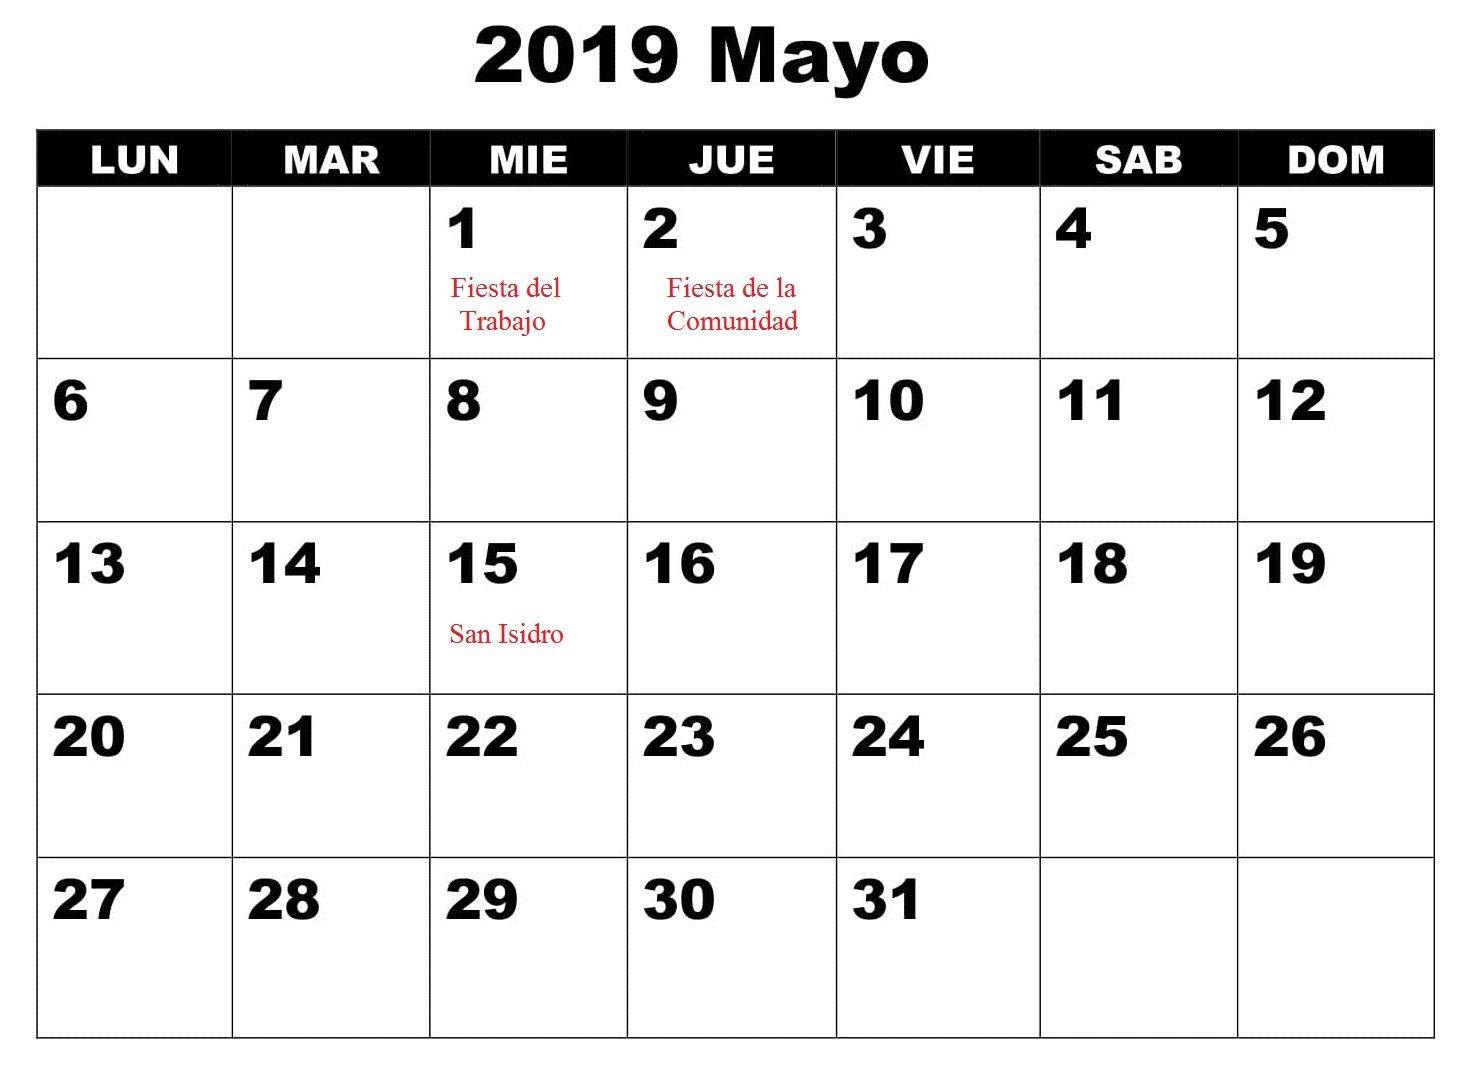 Calendario Con Excel.Calendario Mayo Con Festivos 2019 Word Calendario Mayo